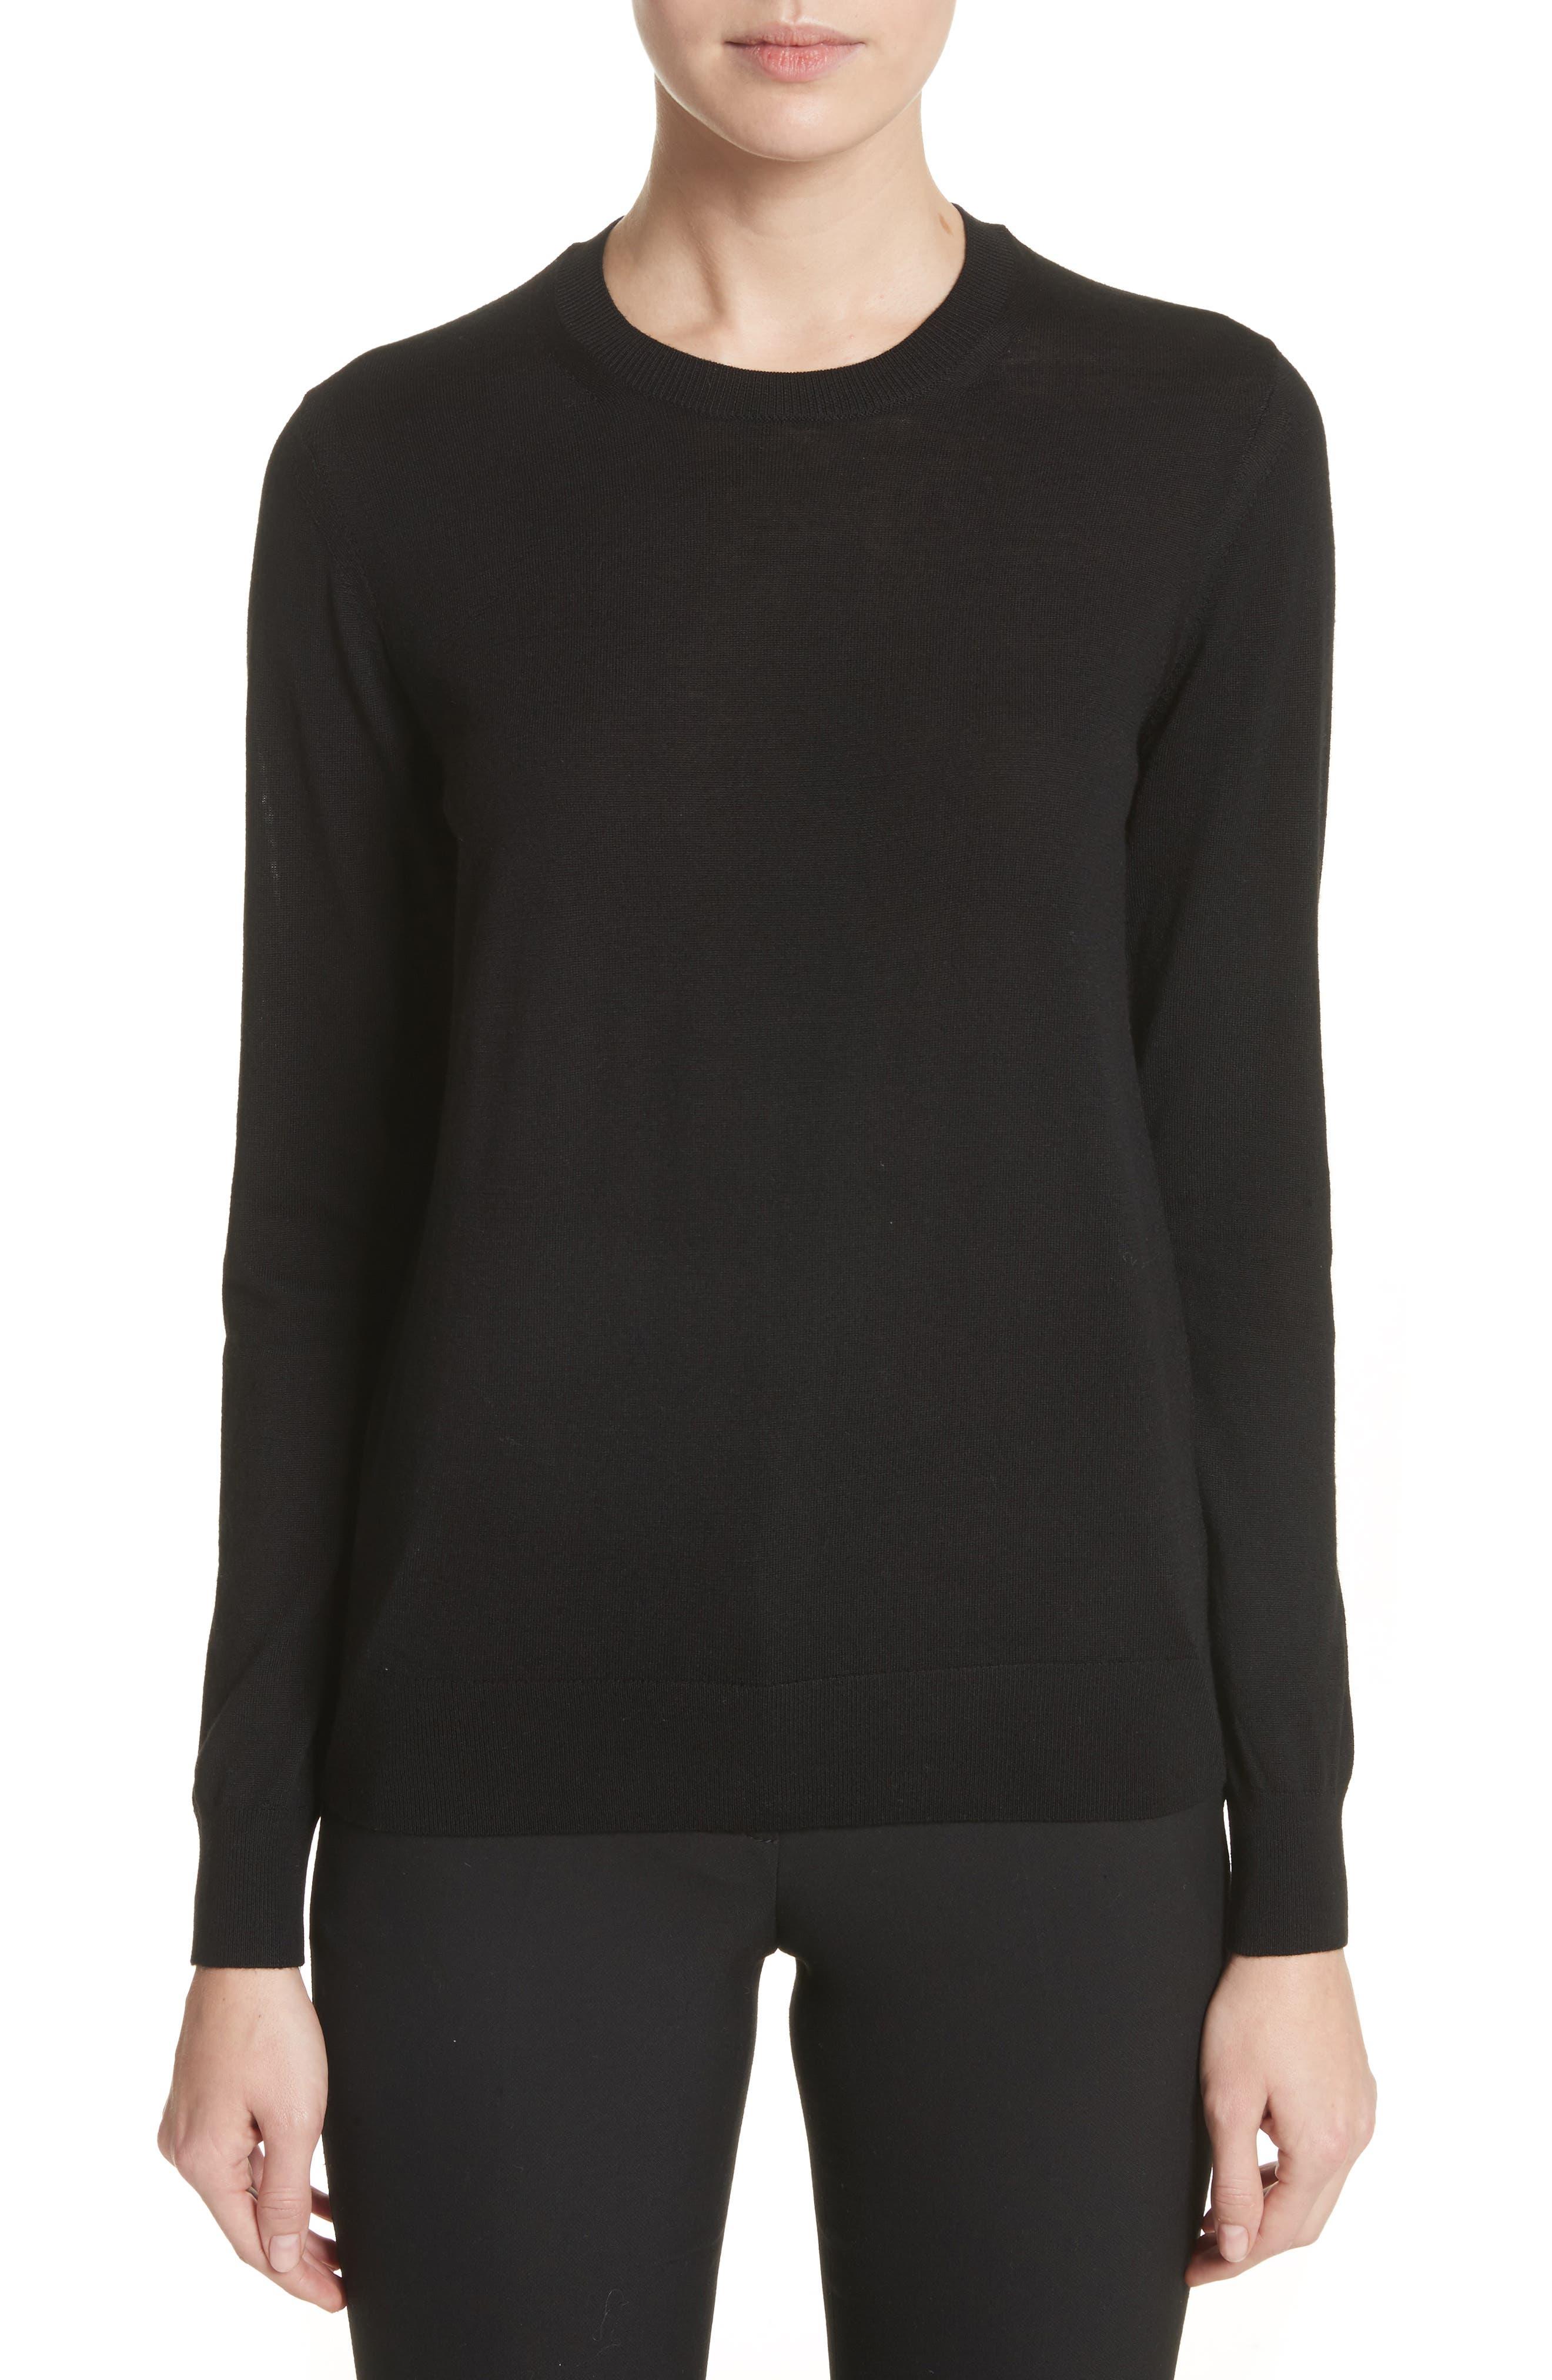 BURBERRY Viar Merino Wool Sweater, Main, color, 001